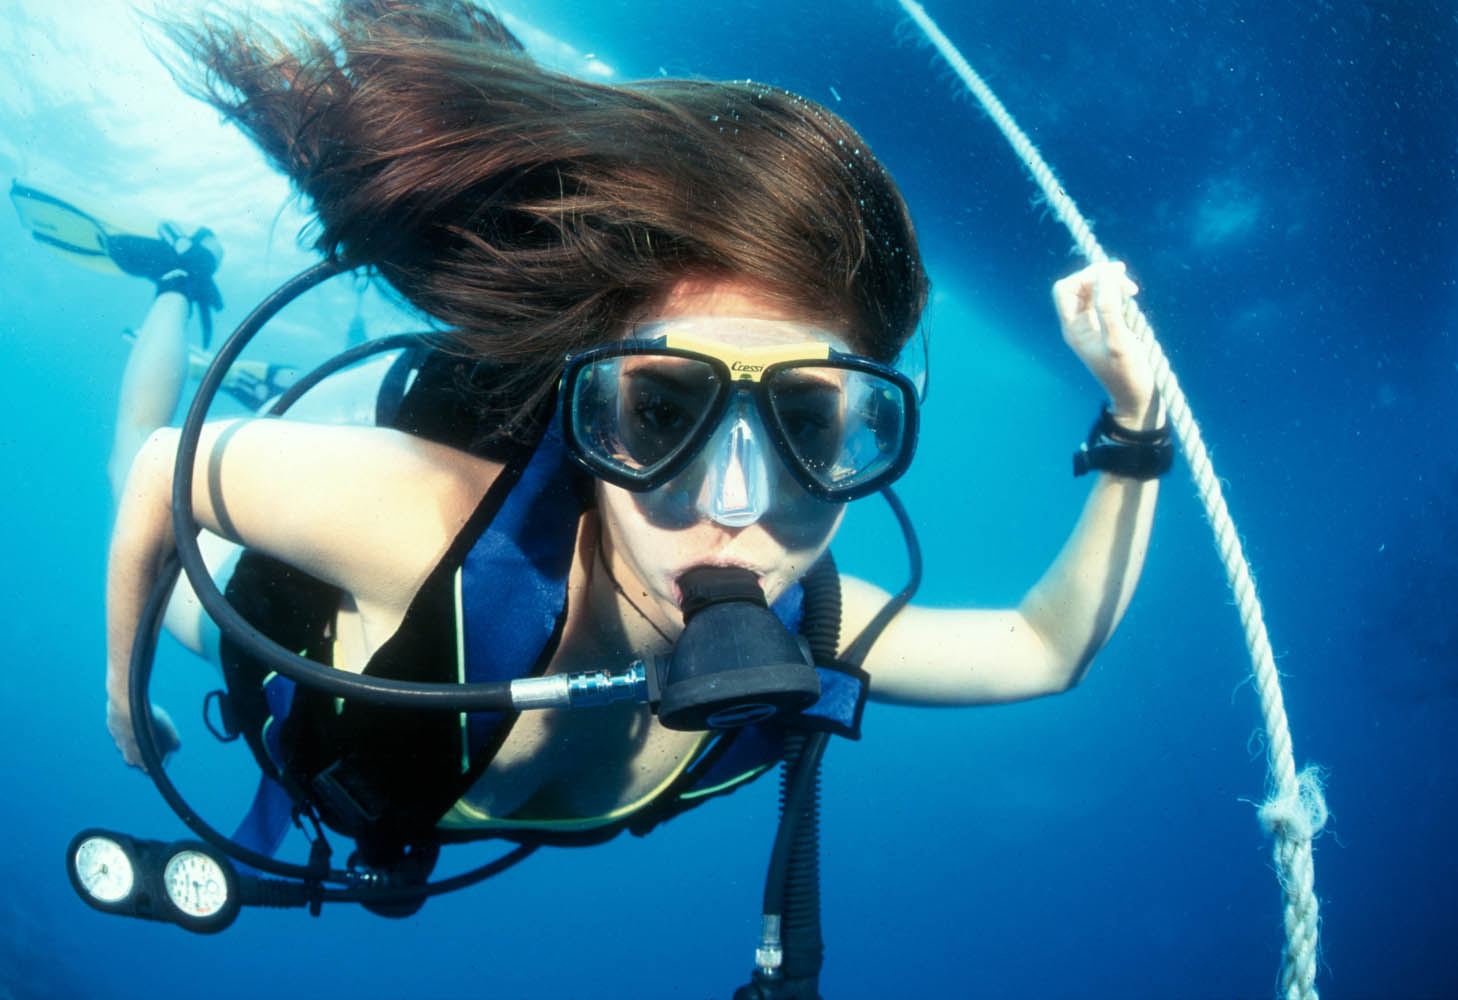 ullaflyTauchen am Grossen Barriere Riff, Australien.Diving the Great Barrier Reef, Australia.Photo: Mike Ball